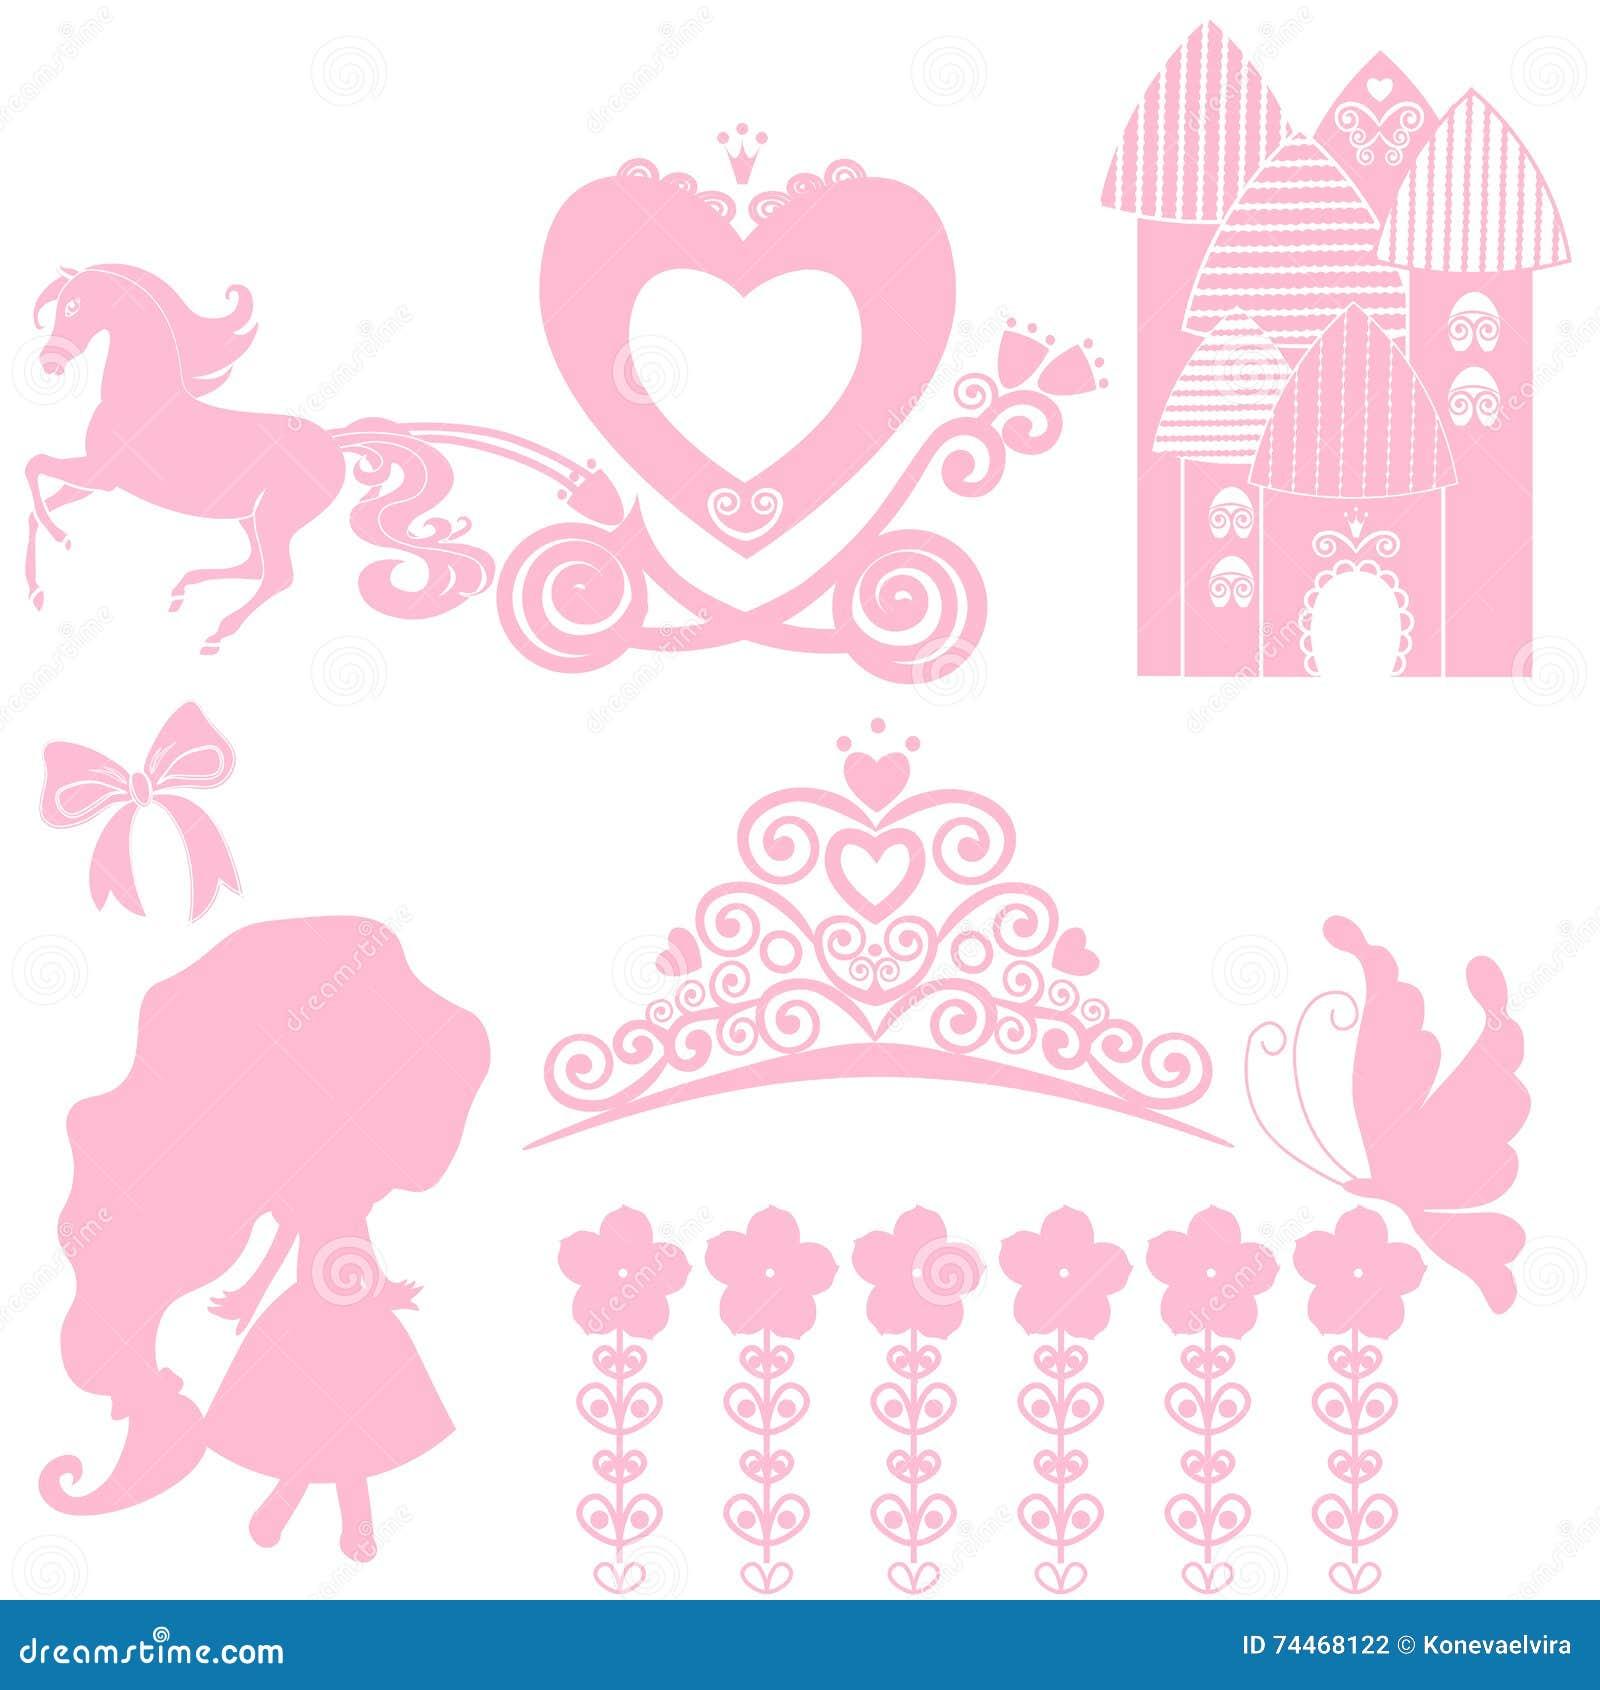 Elegant vector crown or tiara cartoon vector for Small princess